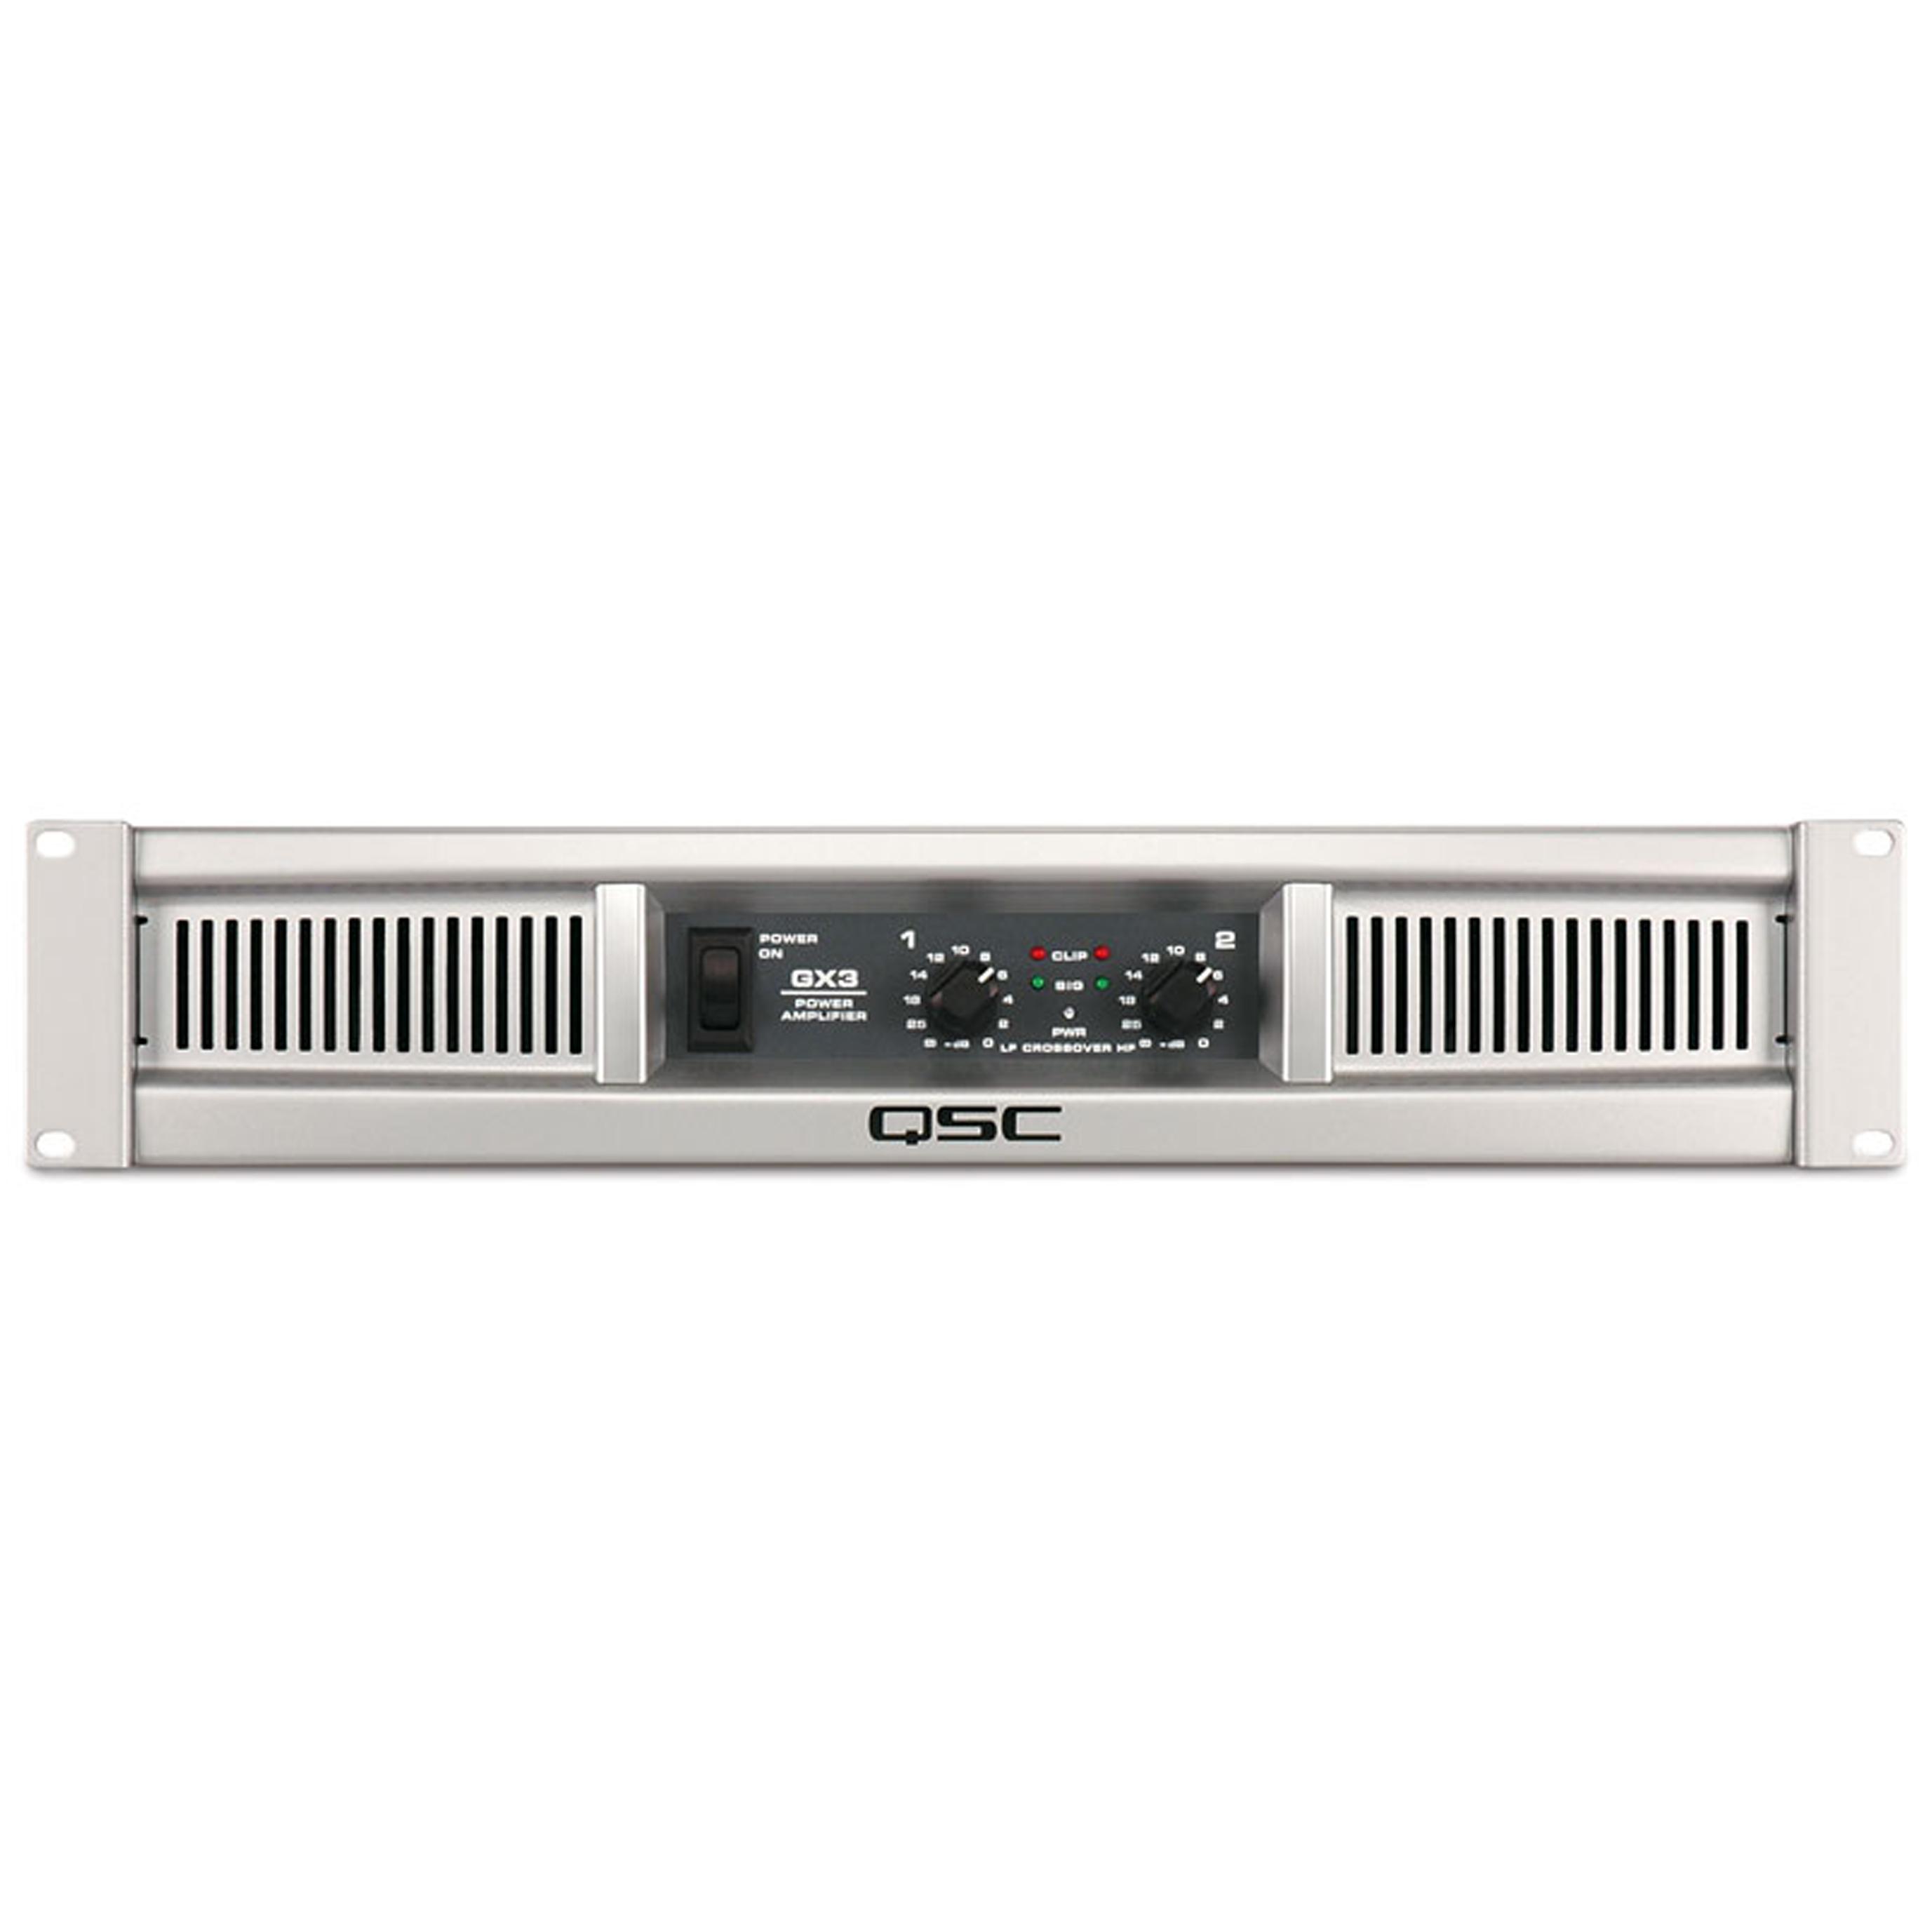 qsc gx3 amplifier pro audio superstore. Black Bedroom Furniture Sets. Home Design Ideas